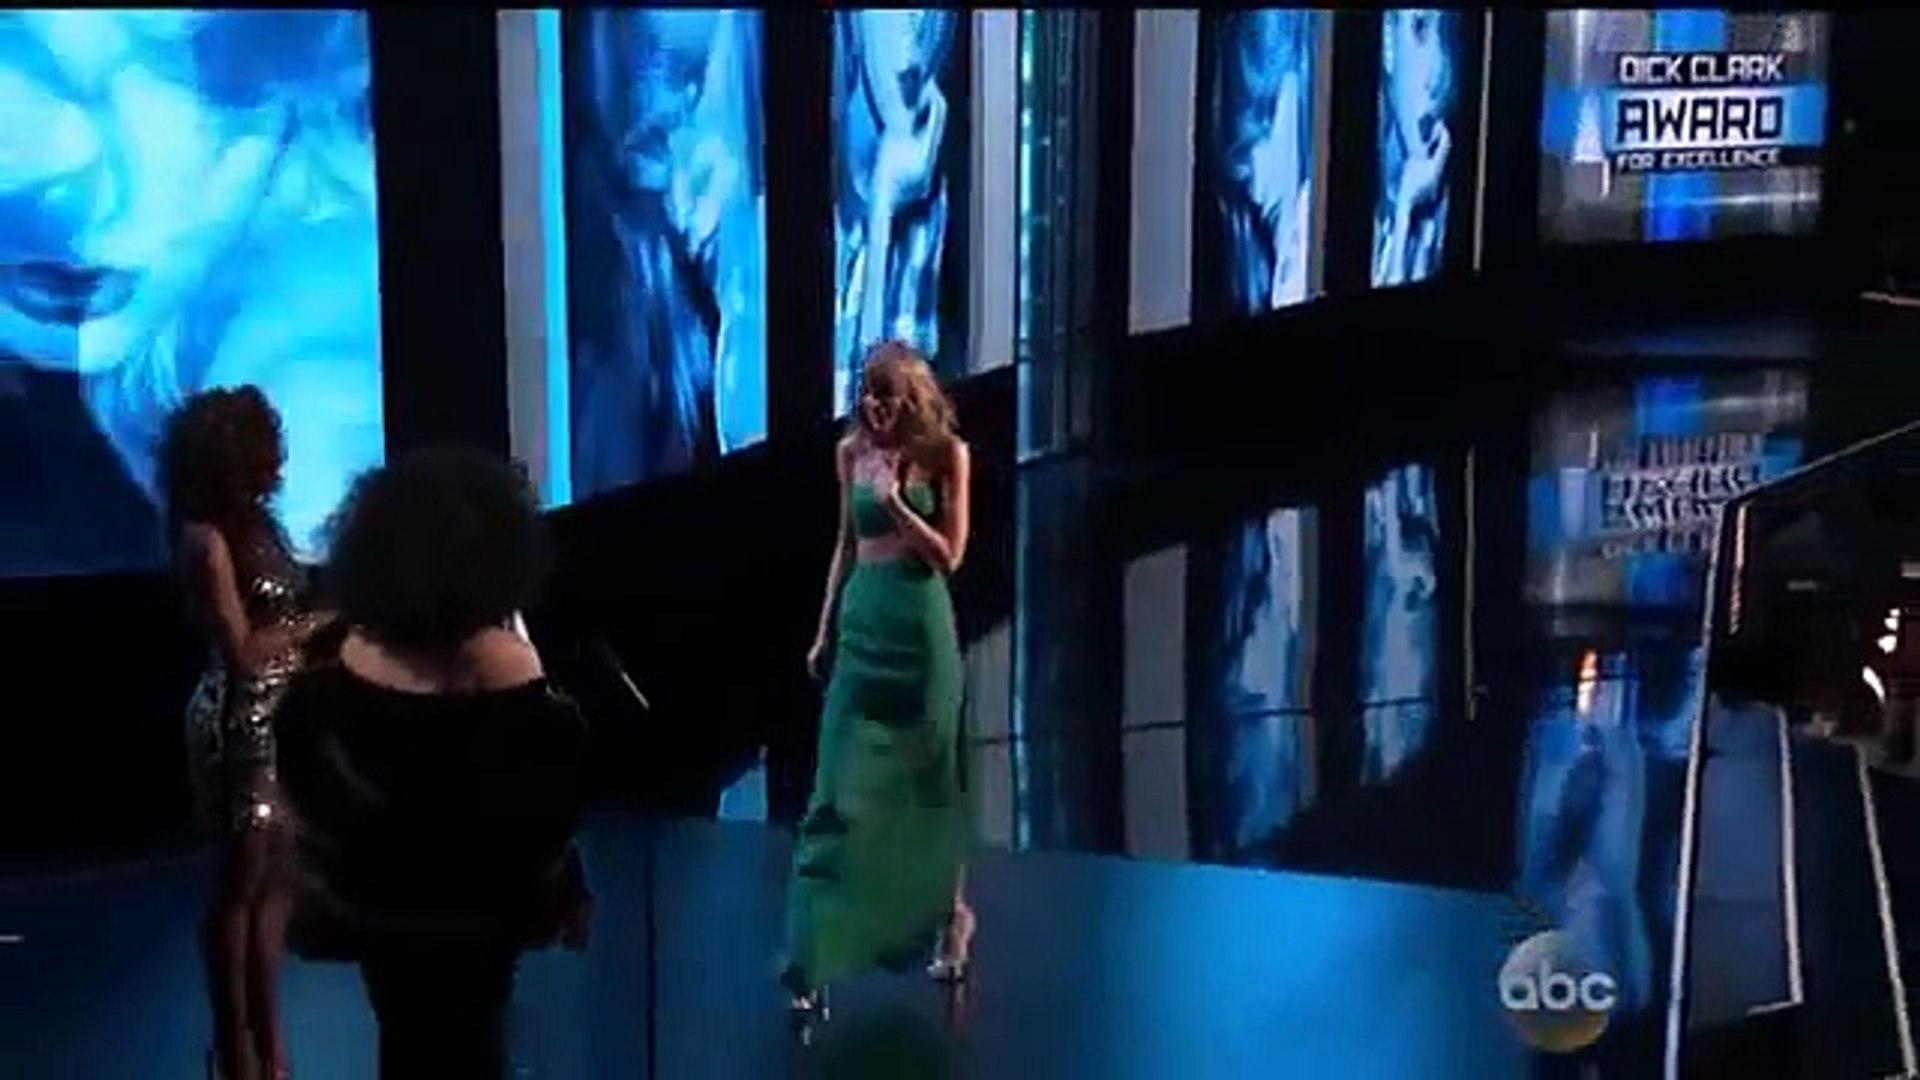 Taylor Swift American Music Awards 2014 - Taylor Swift Wins Diana Ross